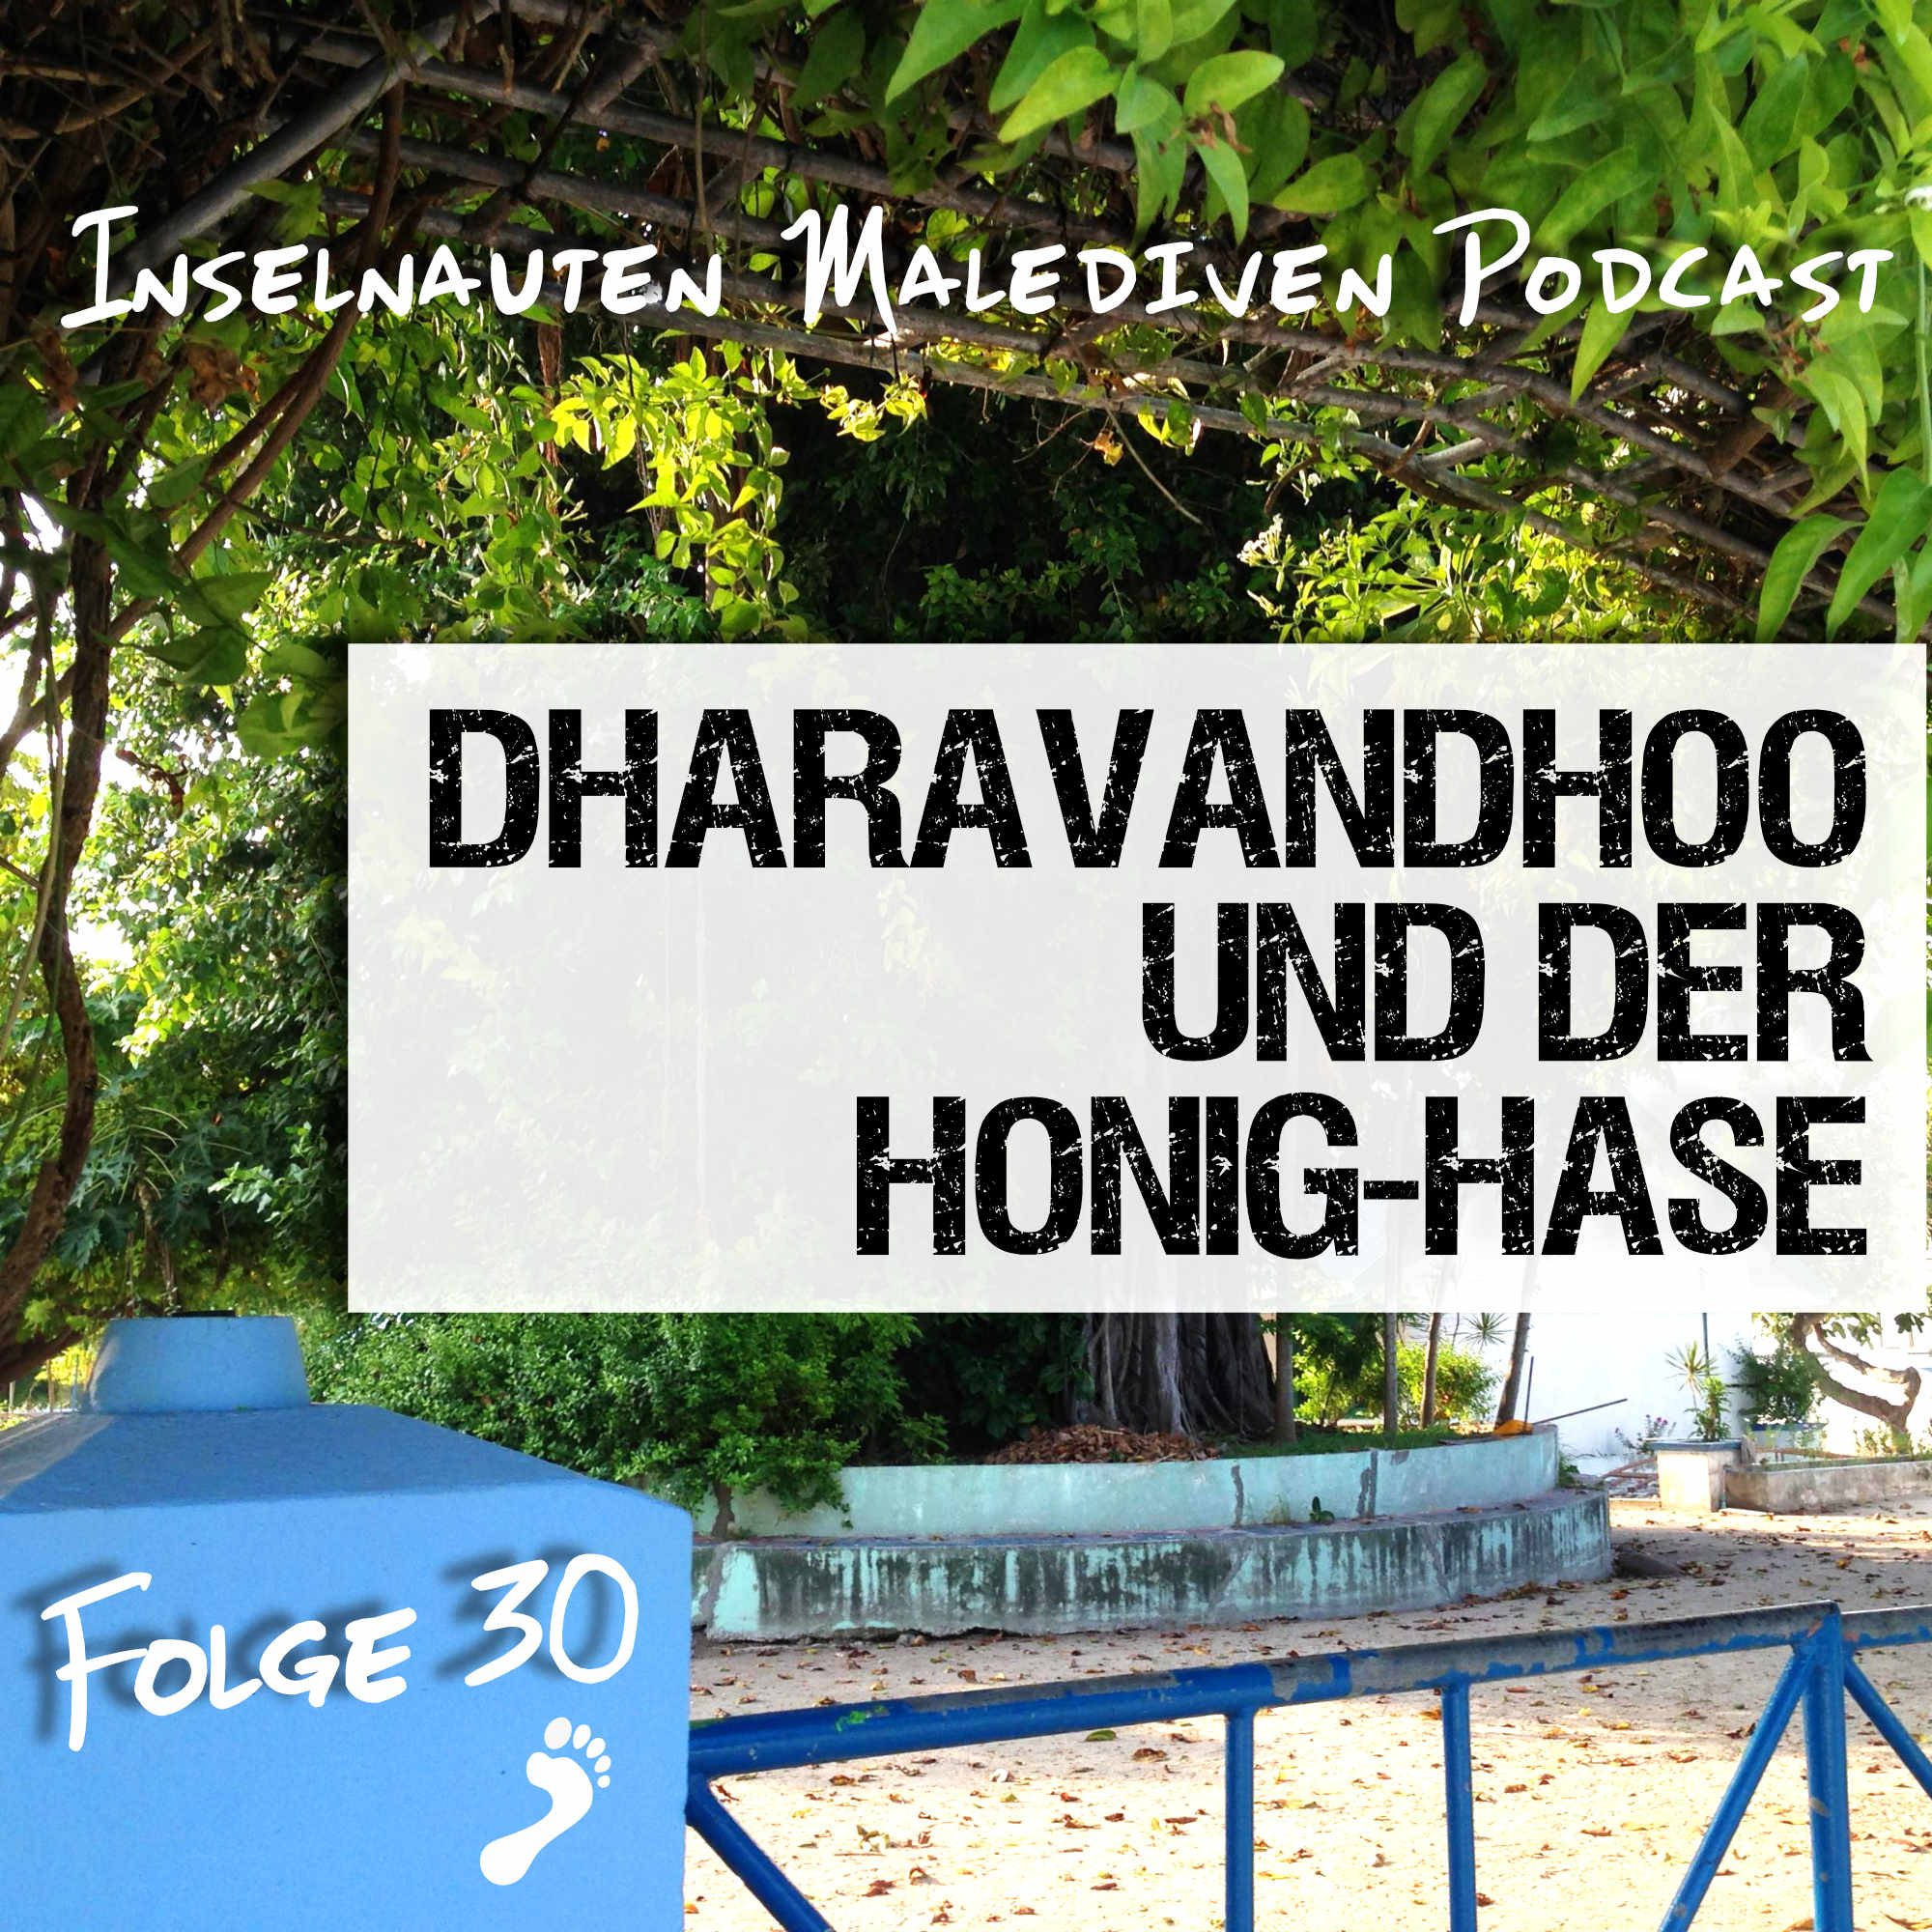 Dharavandhoo Honig Hase - Inselnauten